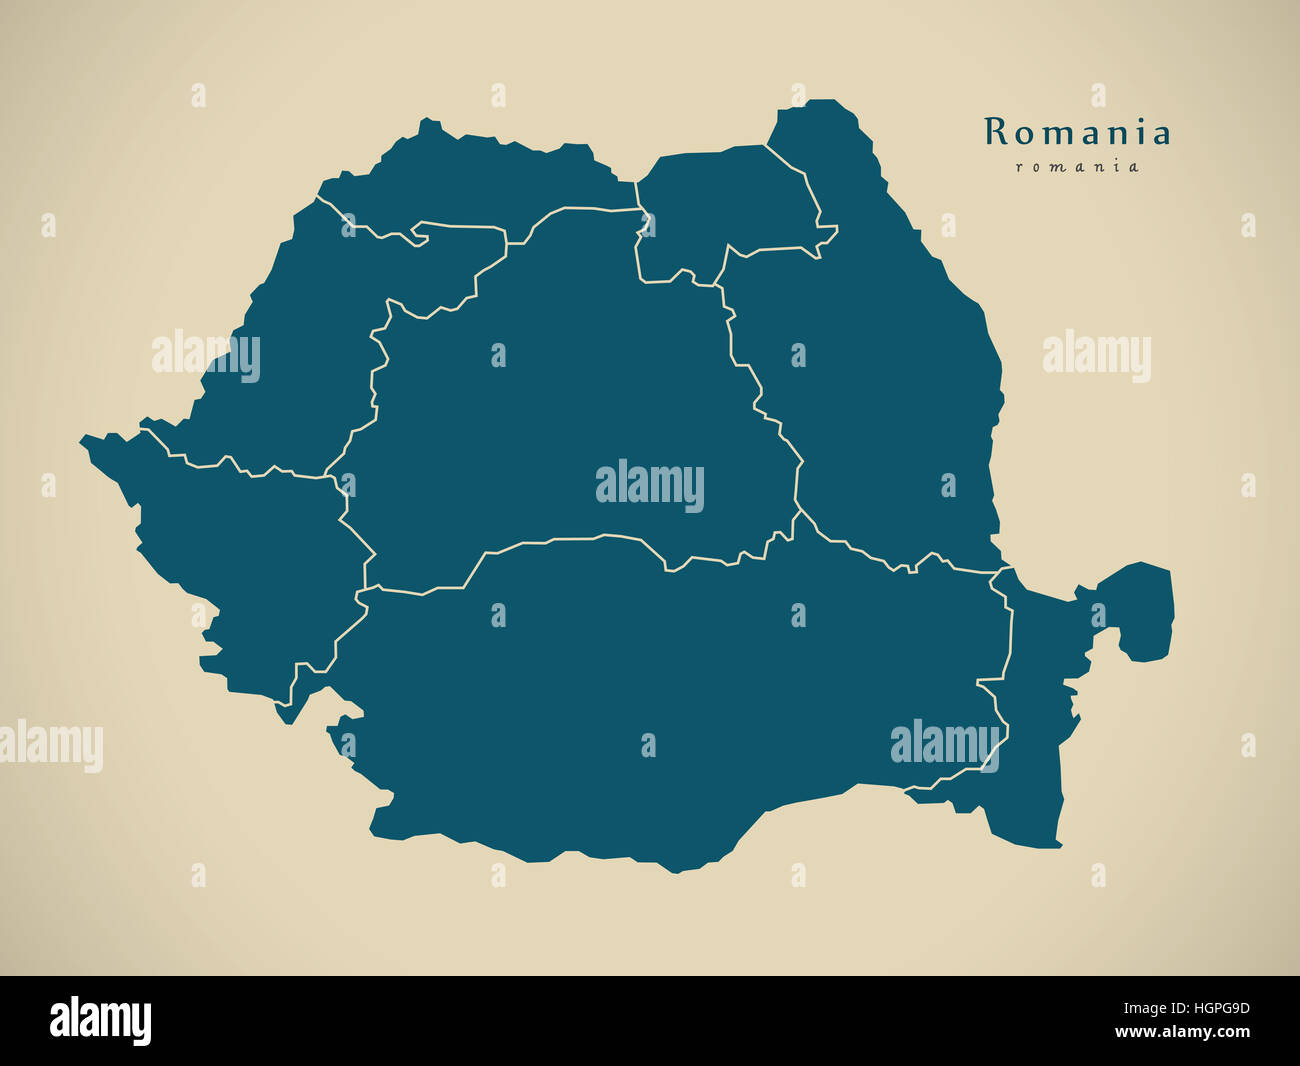 Modern Map - Romania with regions RO illustration - Stock Image